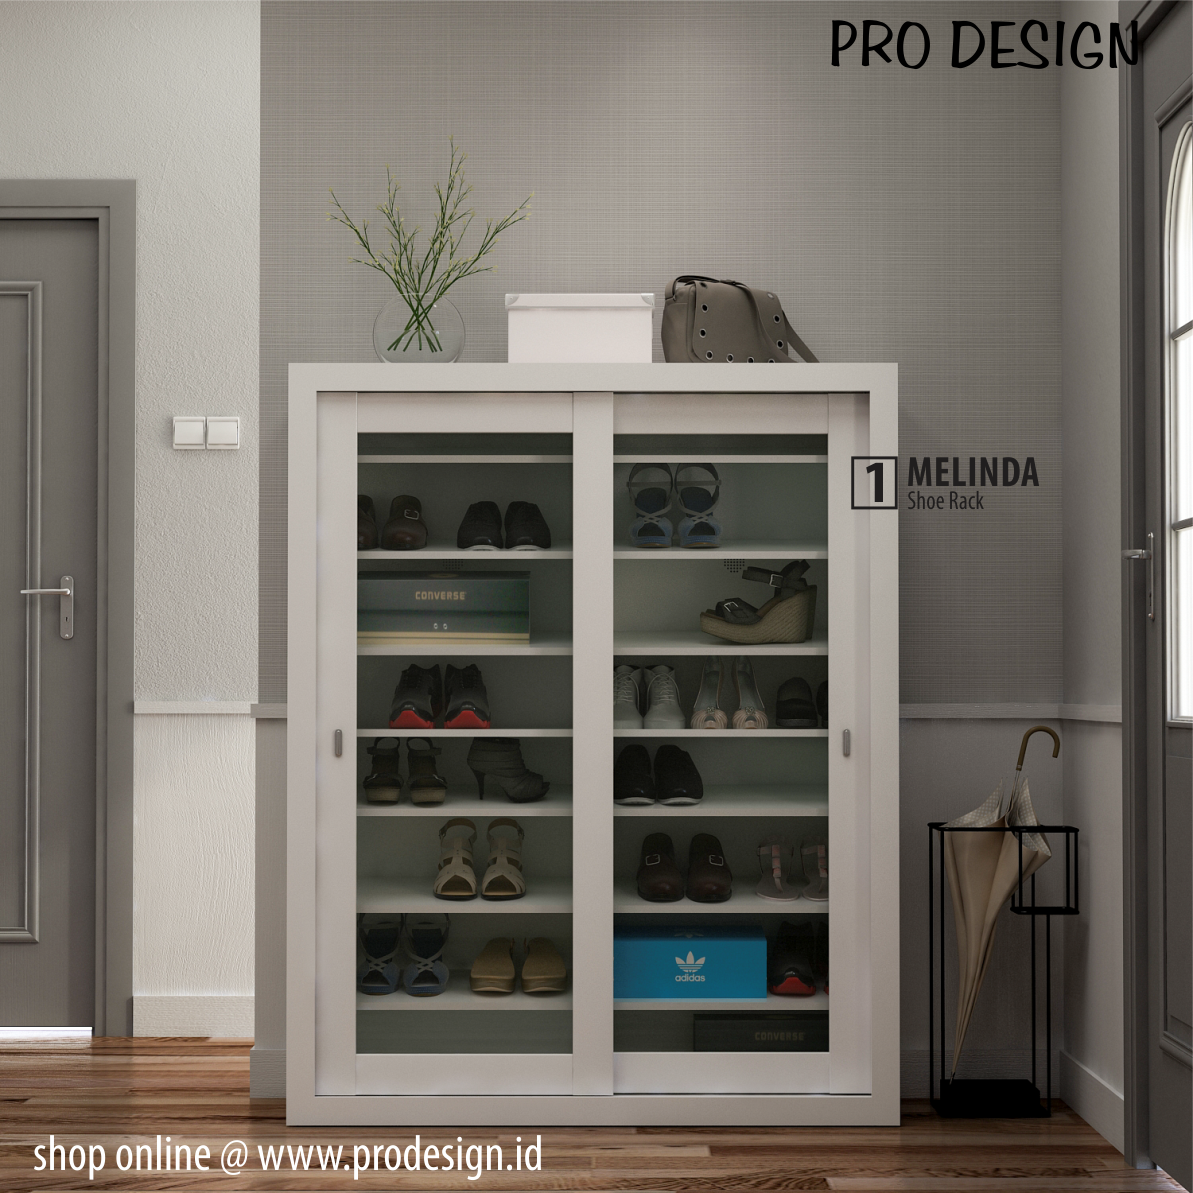 Www Pro Design Com pro design furniture - kumpalo.parkersydnorhistoric